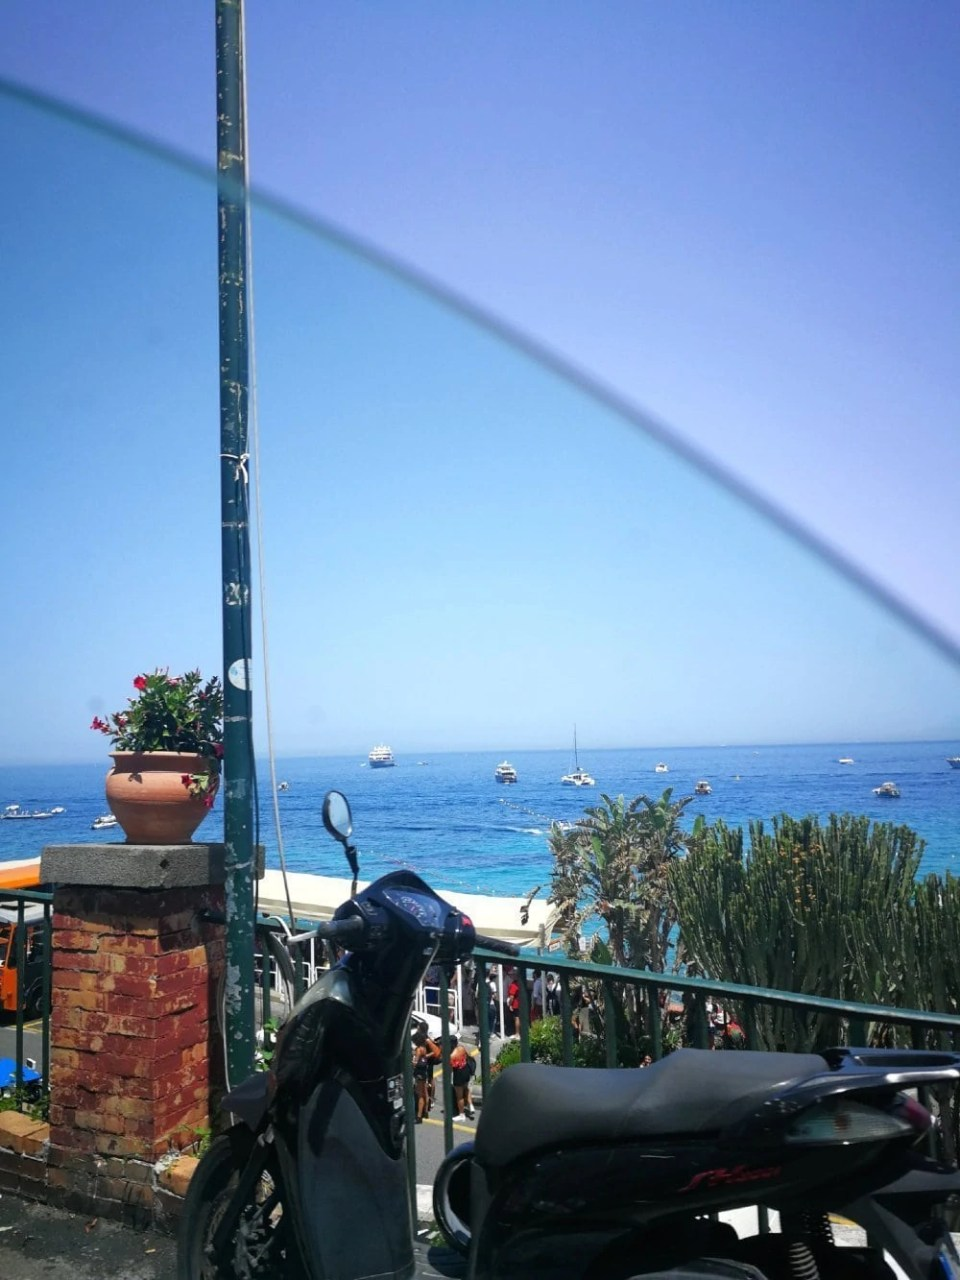 capri island italy.jpg